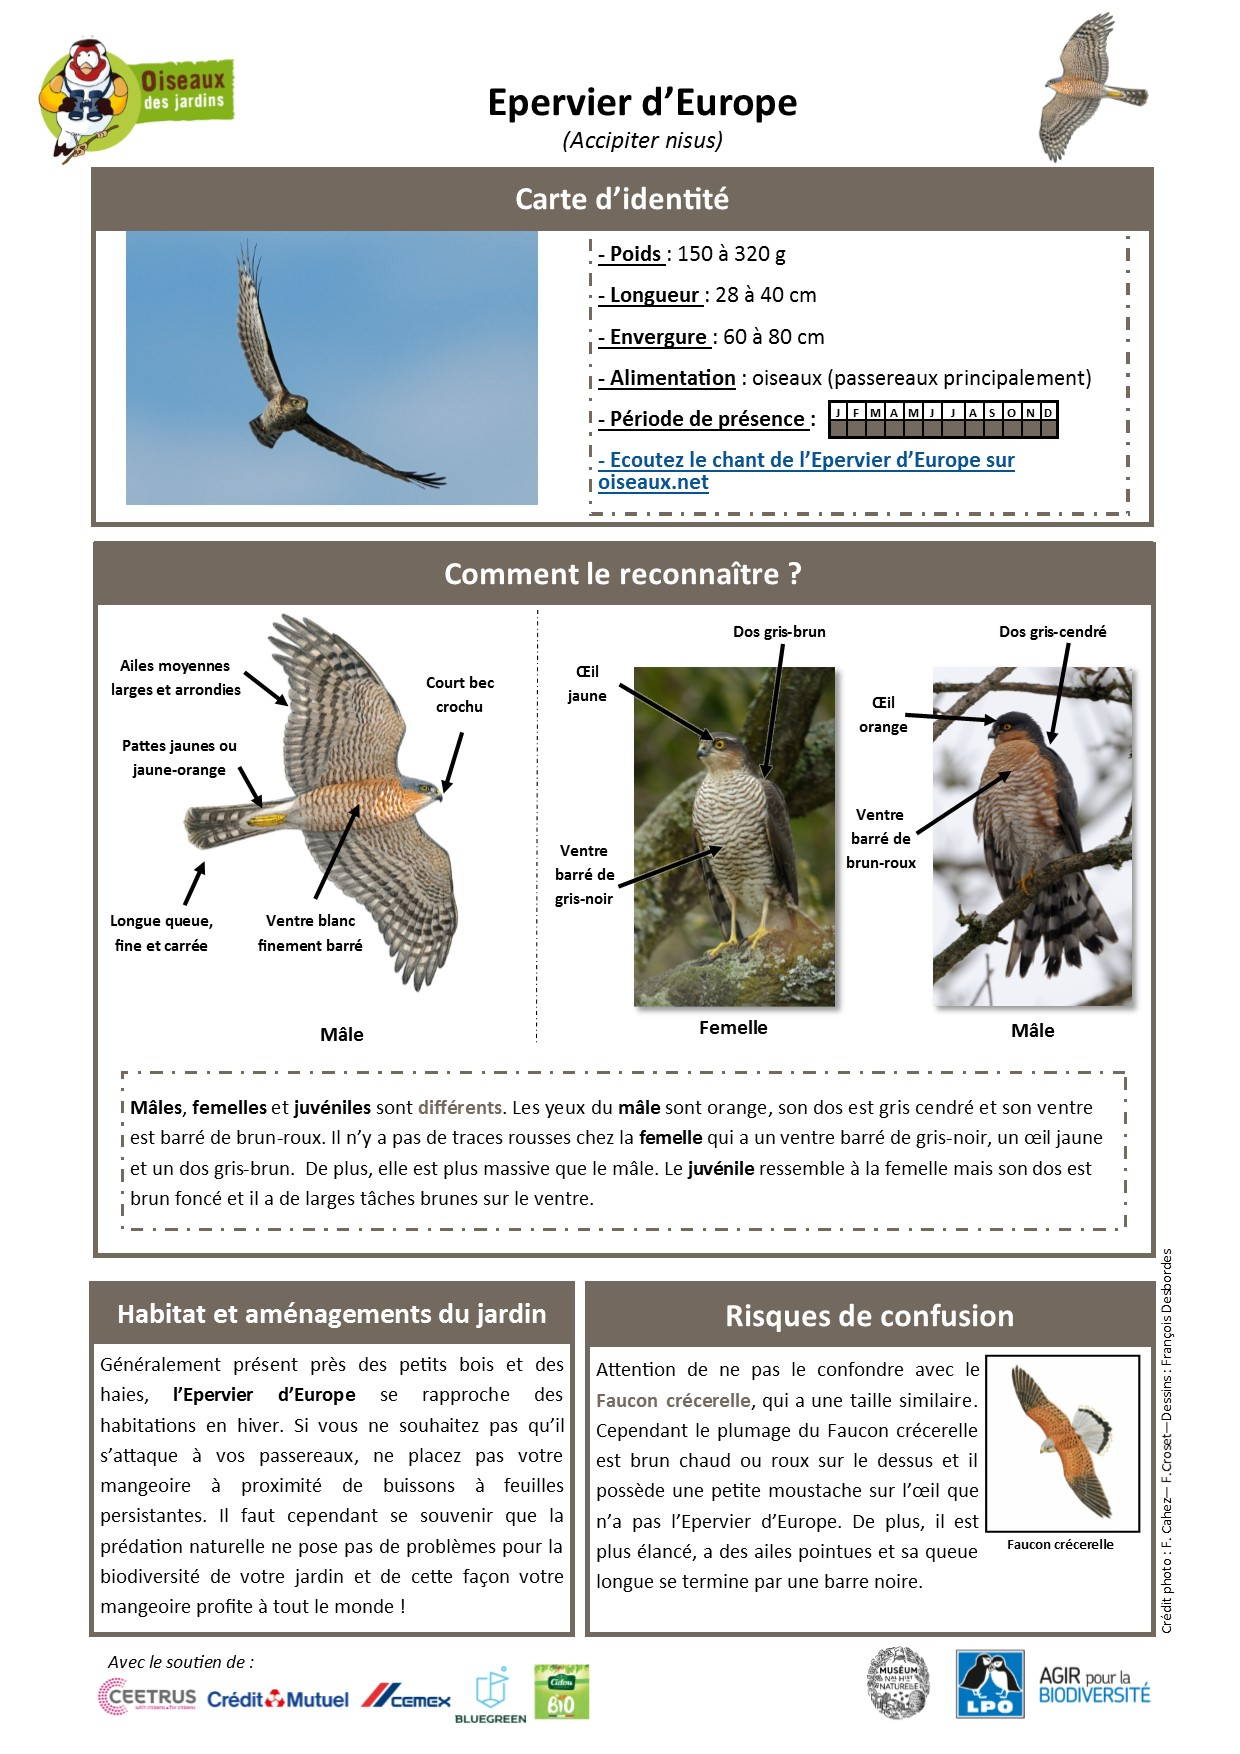 https://cdnfiles1.biolovision.net/www.oiseauxdesjardins.fr/userfiles/Fichesespces/FicheespceEE.pdf